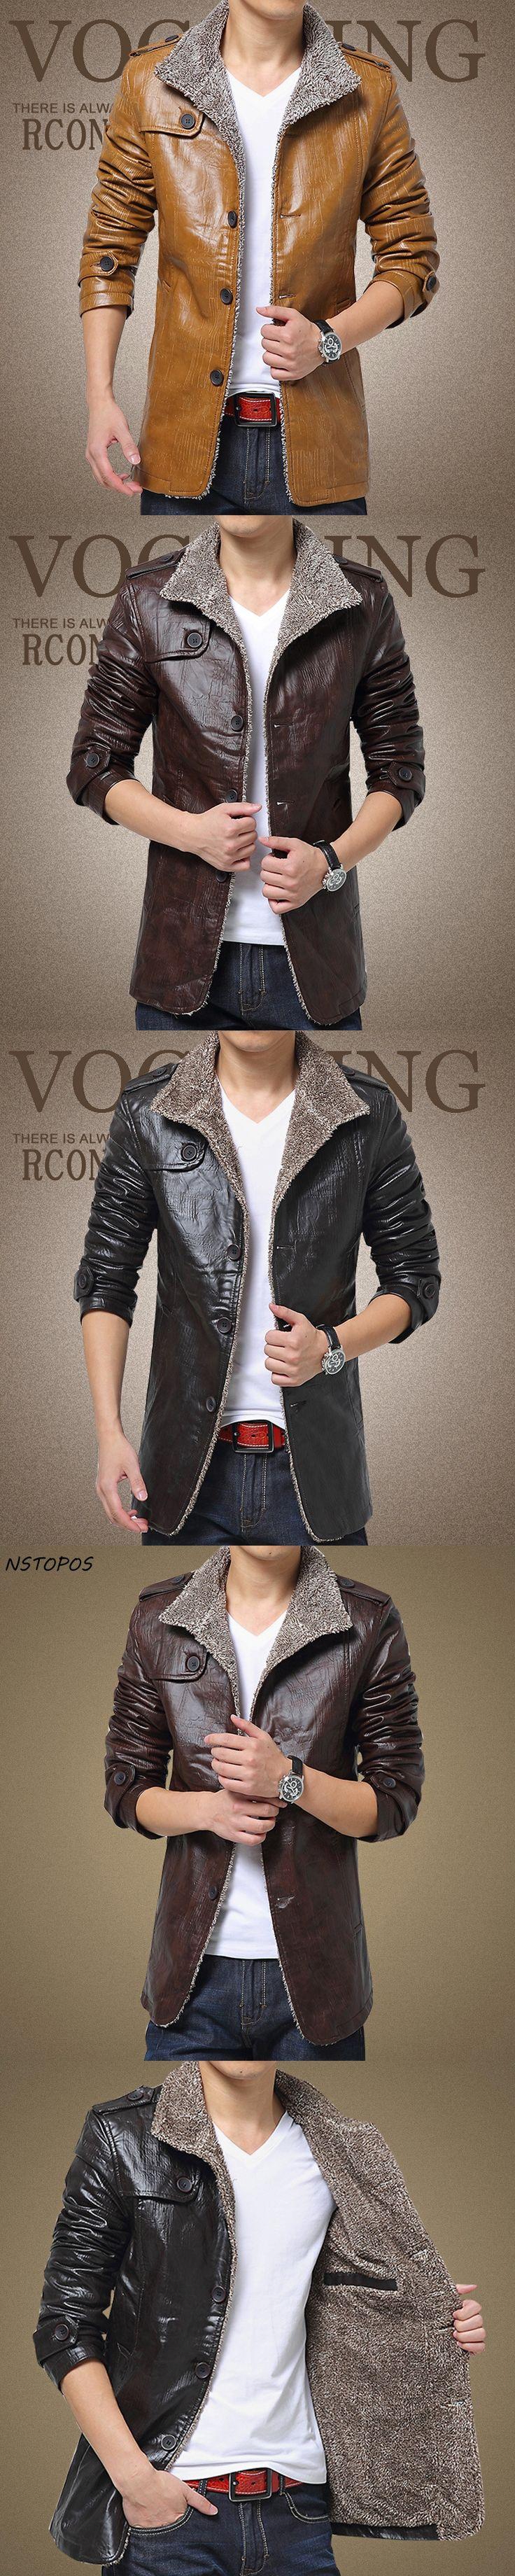 Autumn and winter coat  men's PU leather jacket slim motorcycle leisure suede windbreaker Jacket  blouson cuir homme